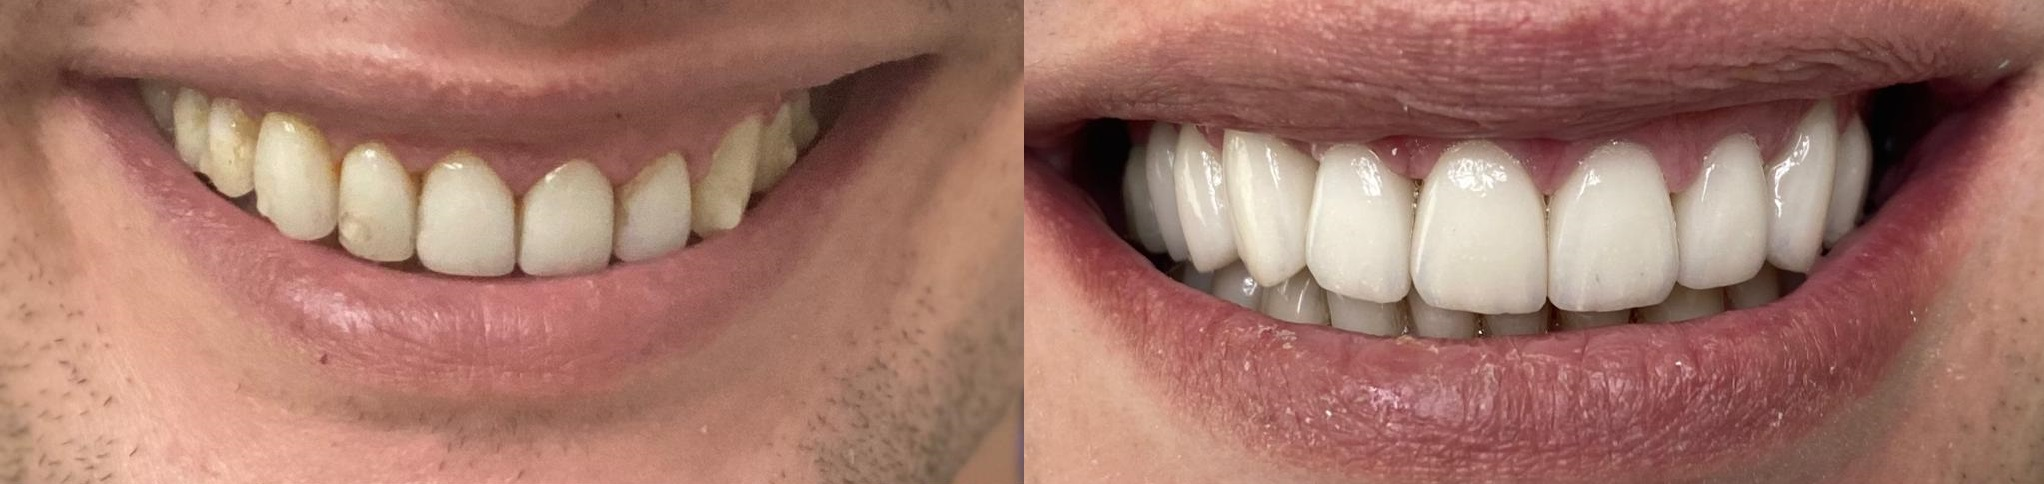 Periodontia Goldmann Odontologia